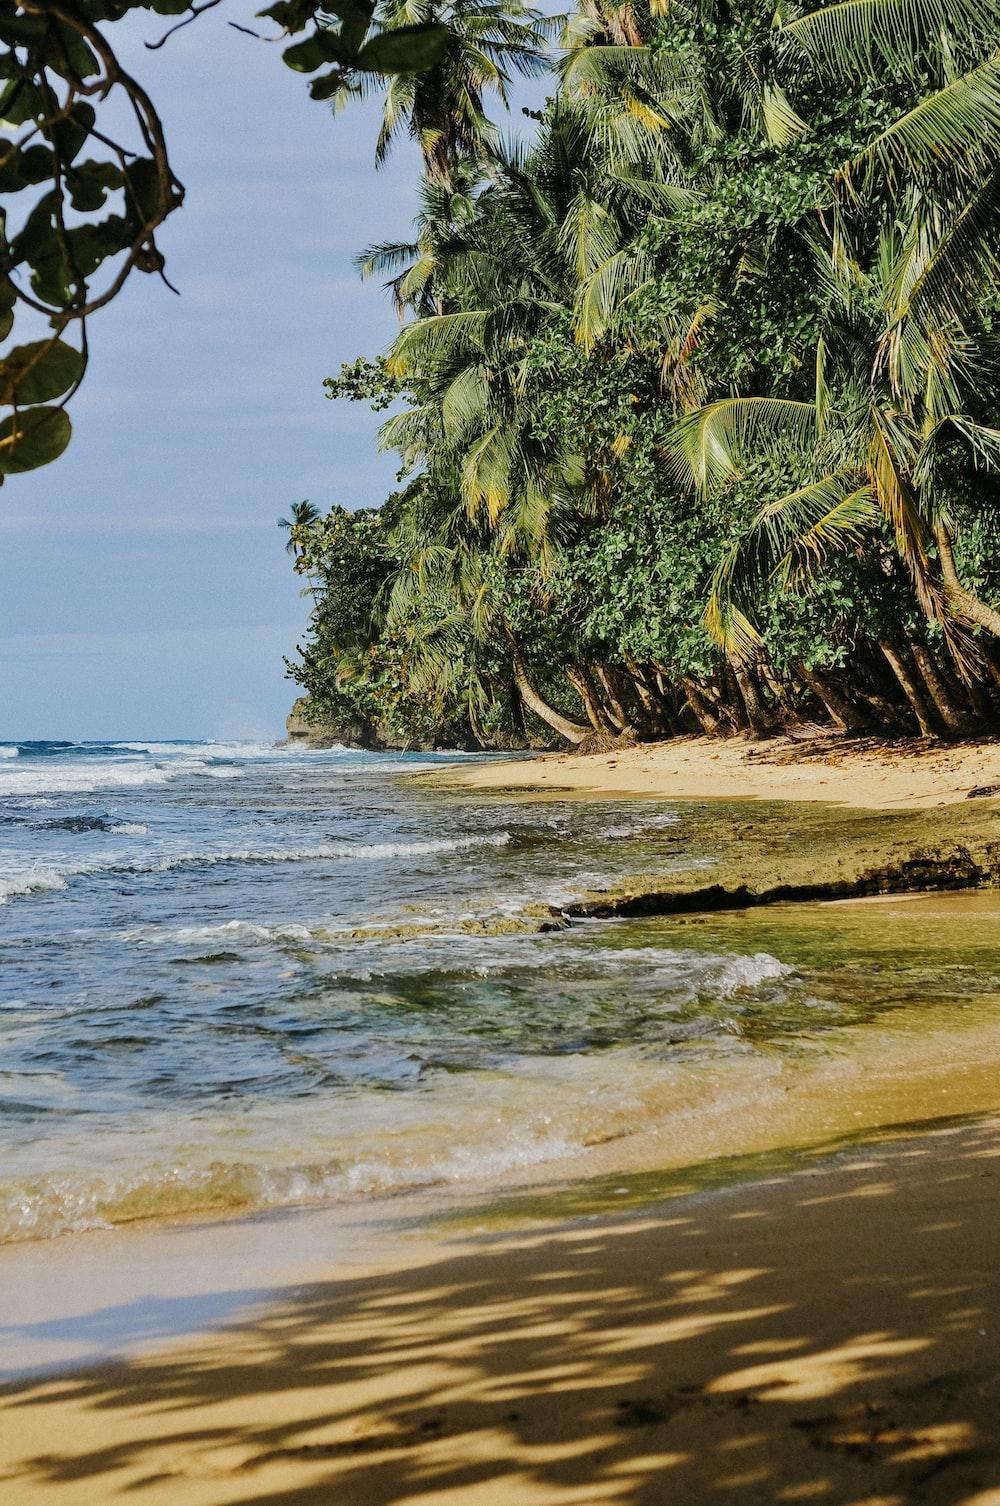 green palm trees nearby seashores